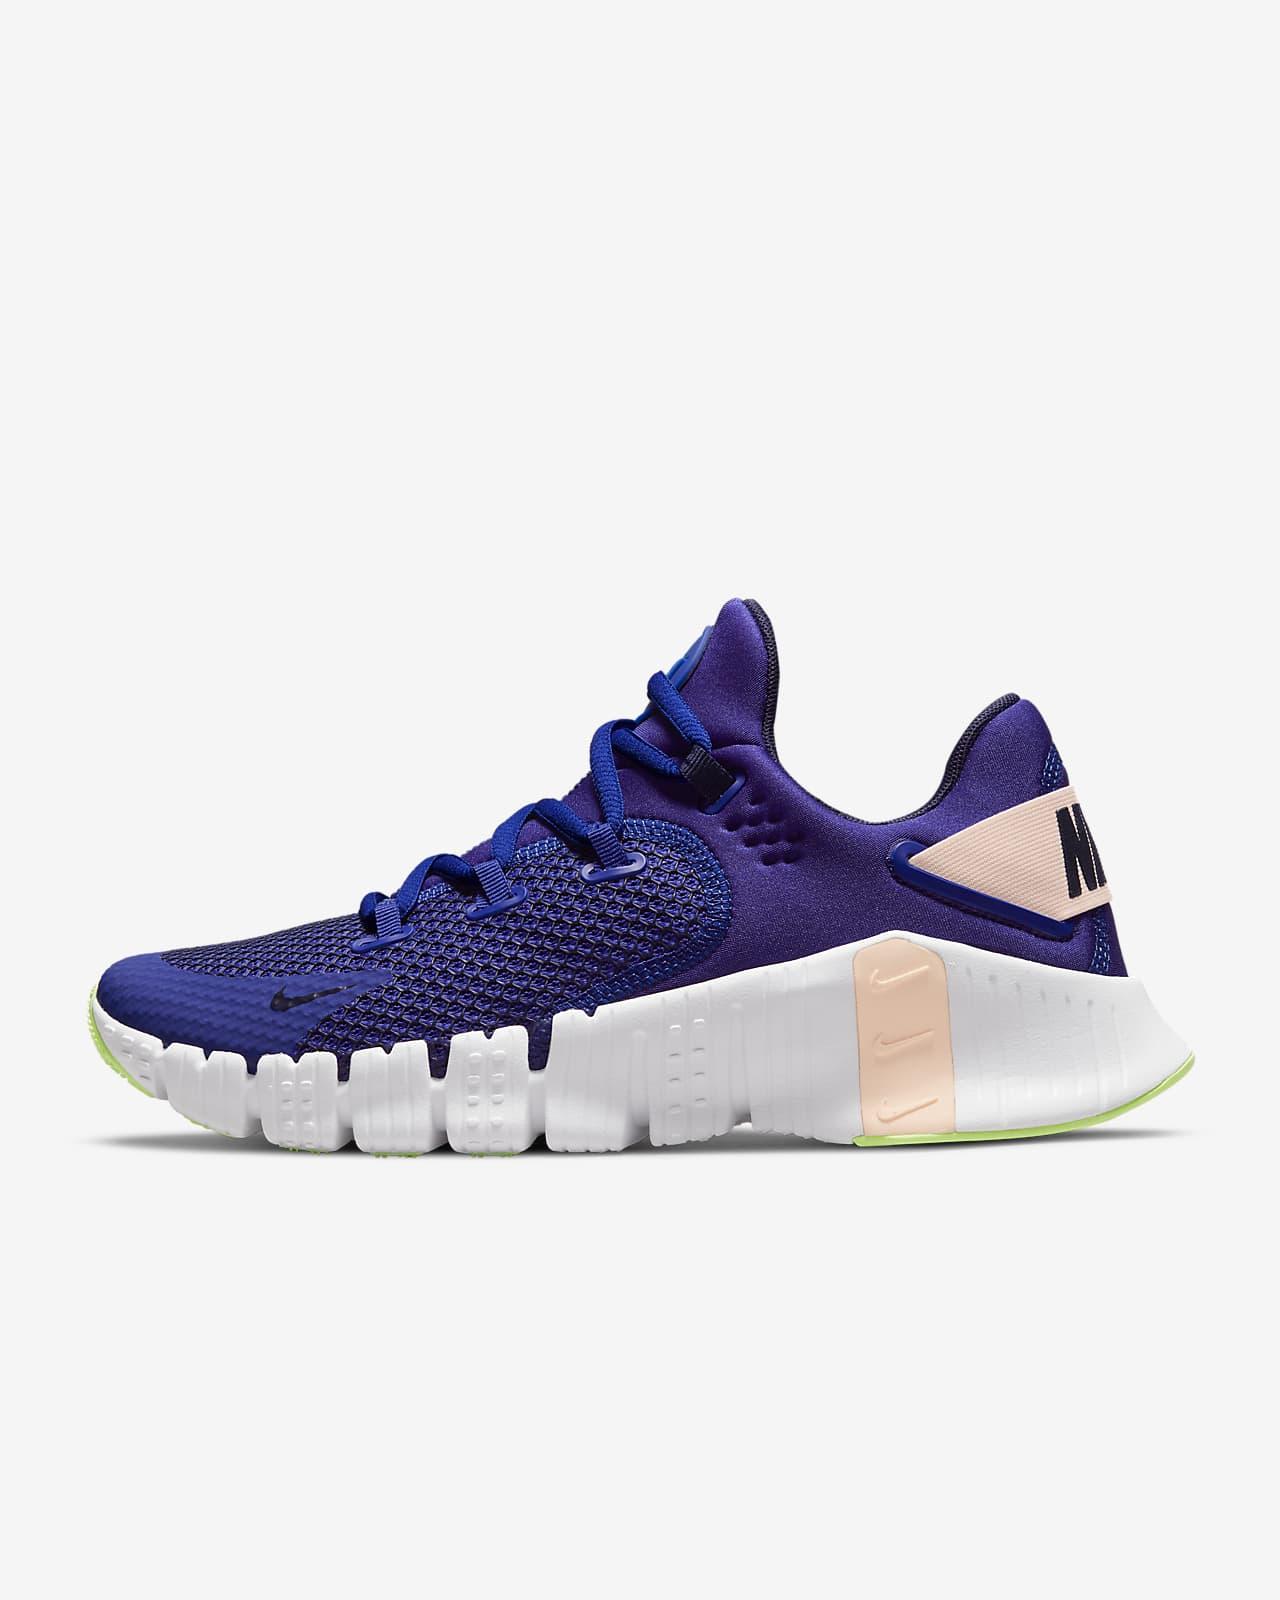 Chaussure de training Nike Free Metcon 4 pour Femme